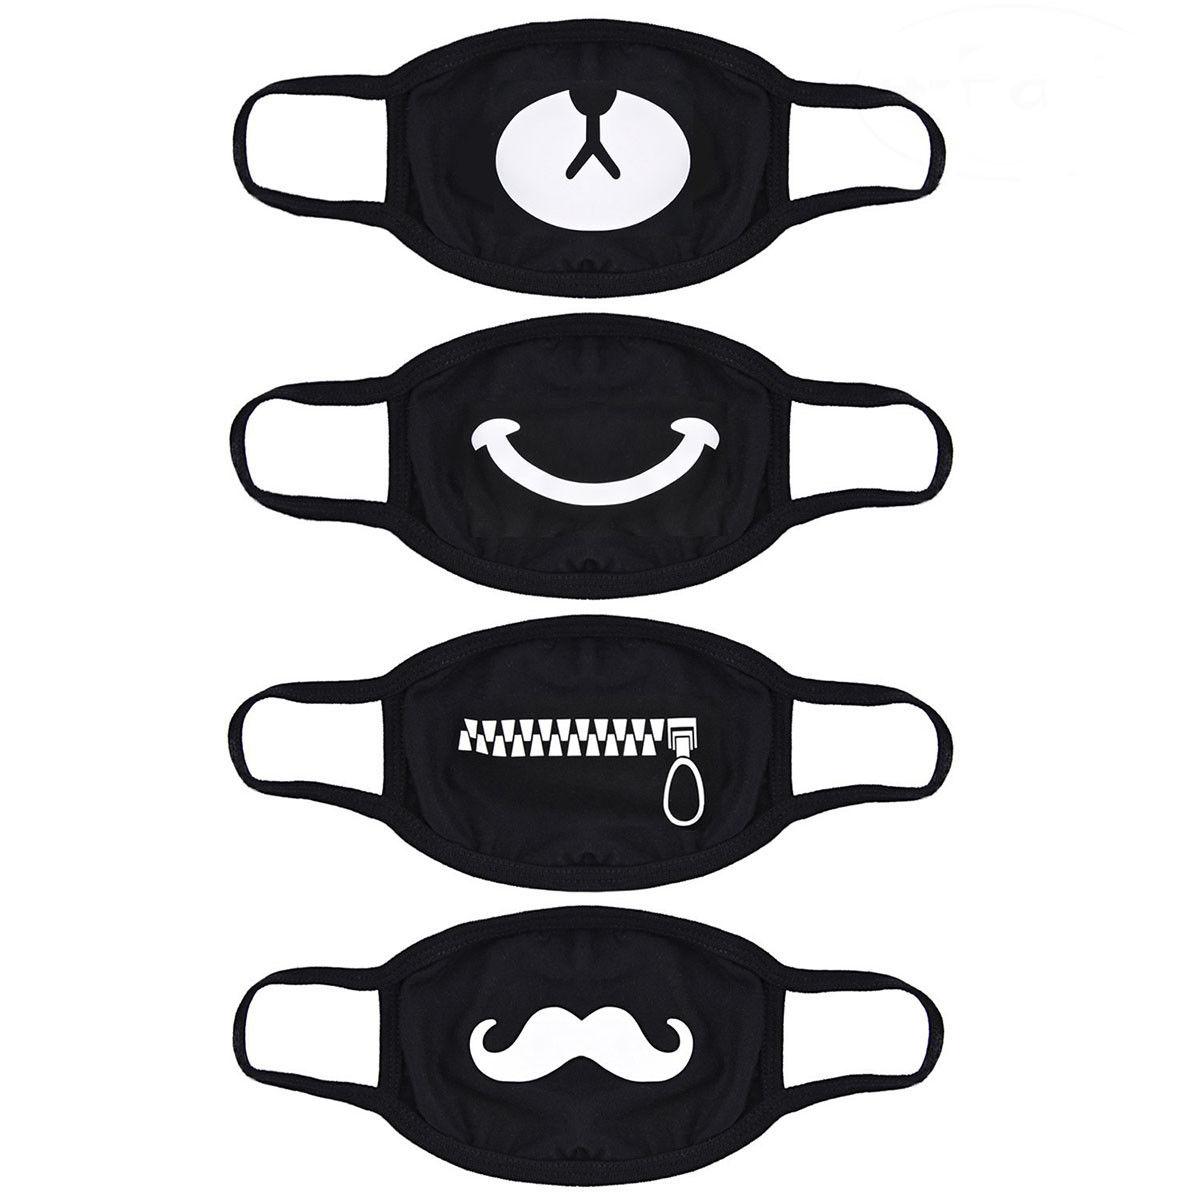 kpop black and white face masks